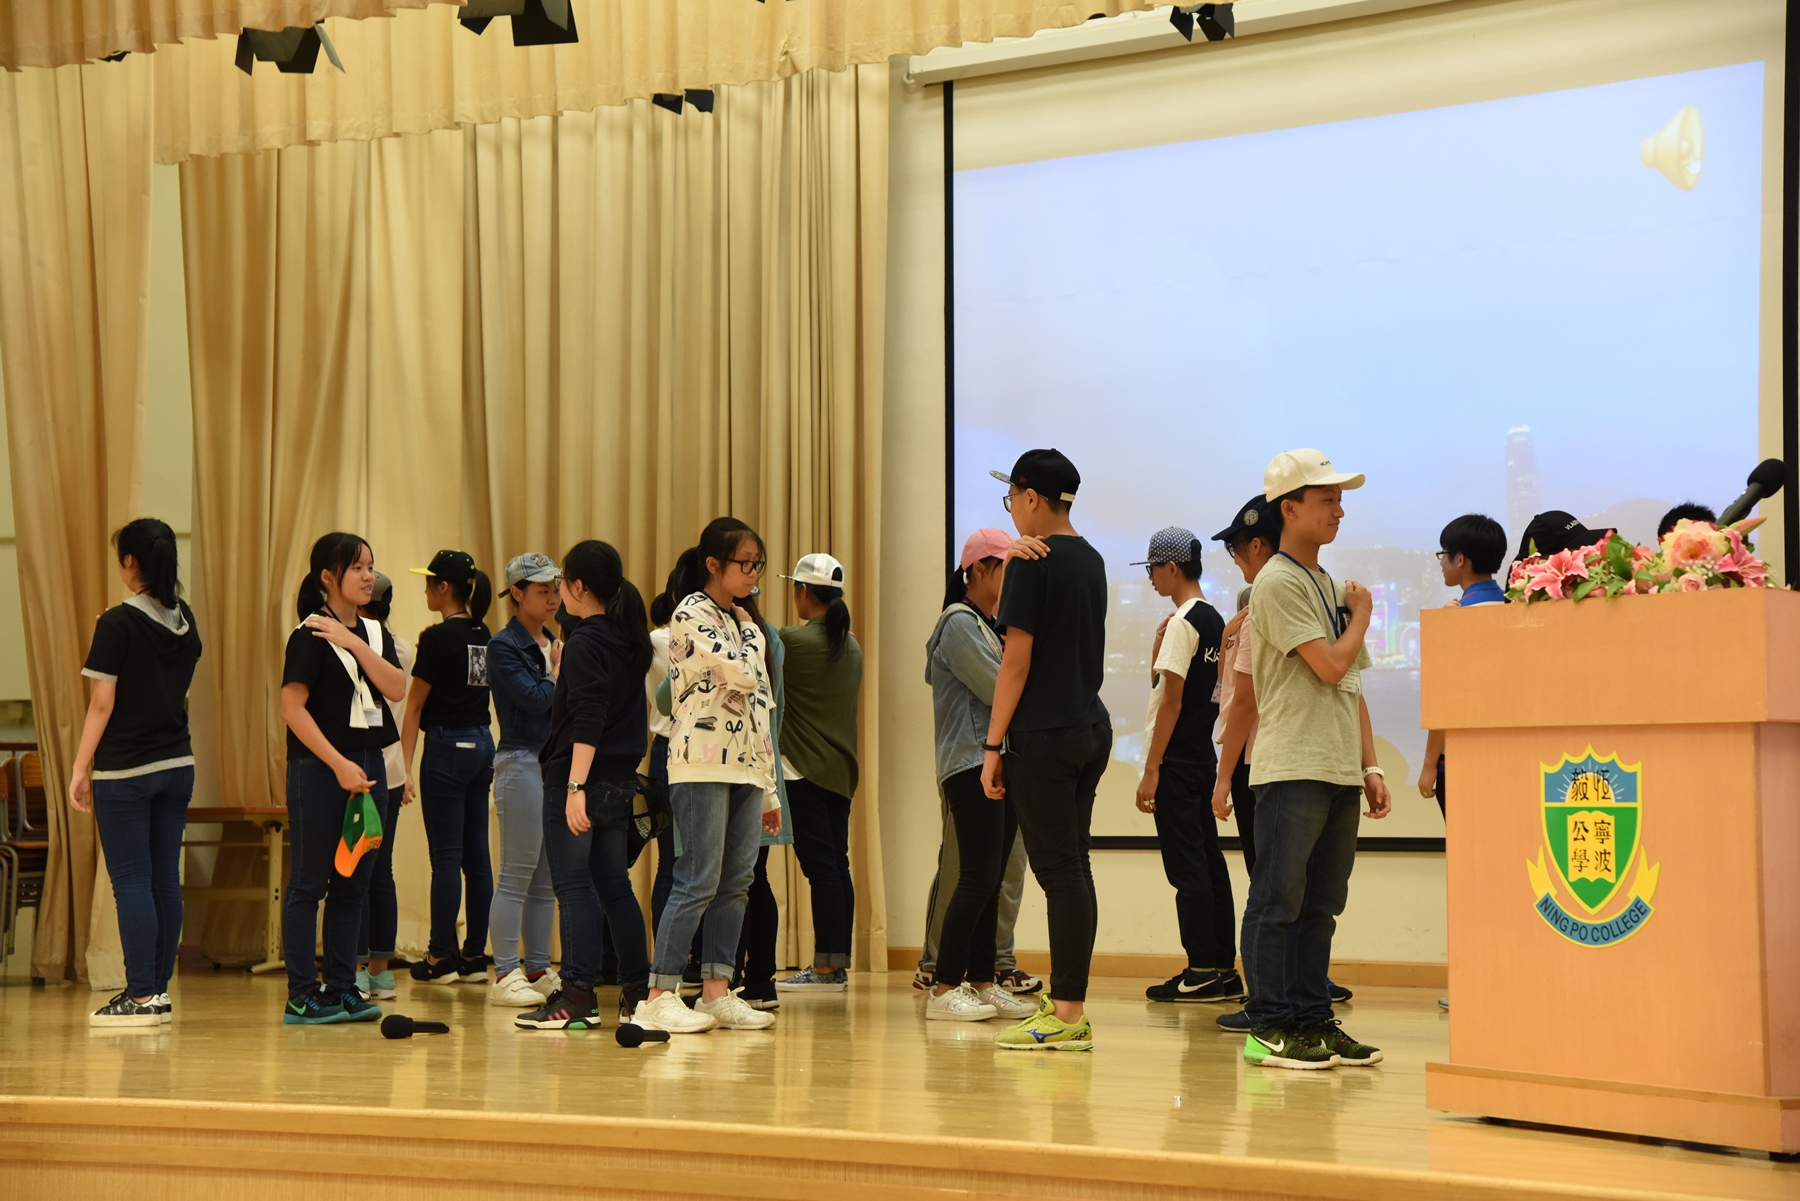 http://www.npc.edu.hk/sites/default/files/dsc_0201_1.jpg